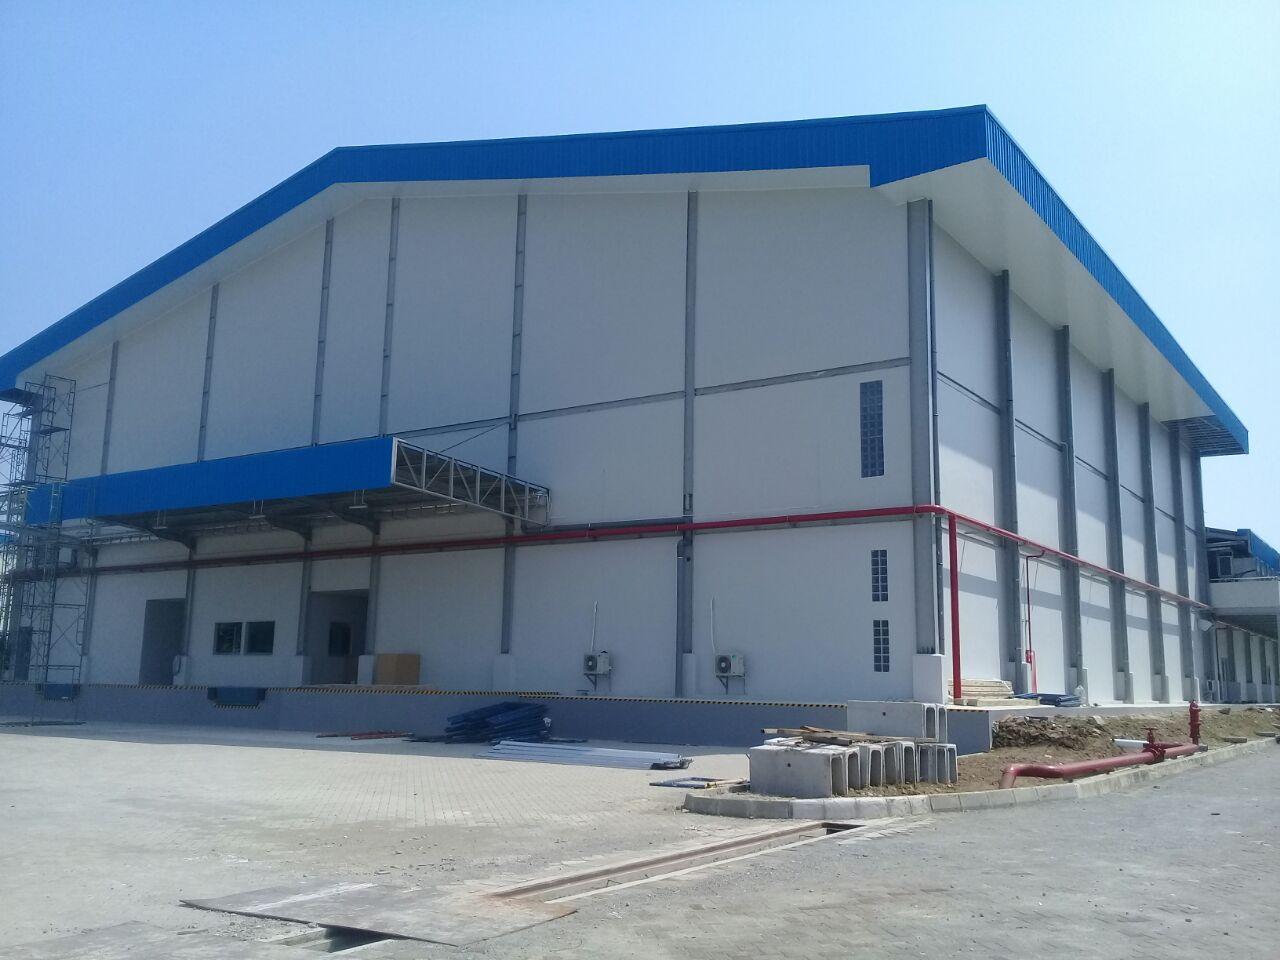 Lowongan Kerja Pabrik 2018 Karawang PT Beta Pharmacon Terbaru